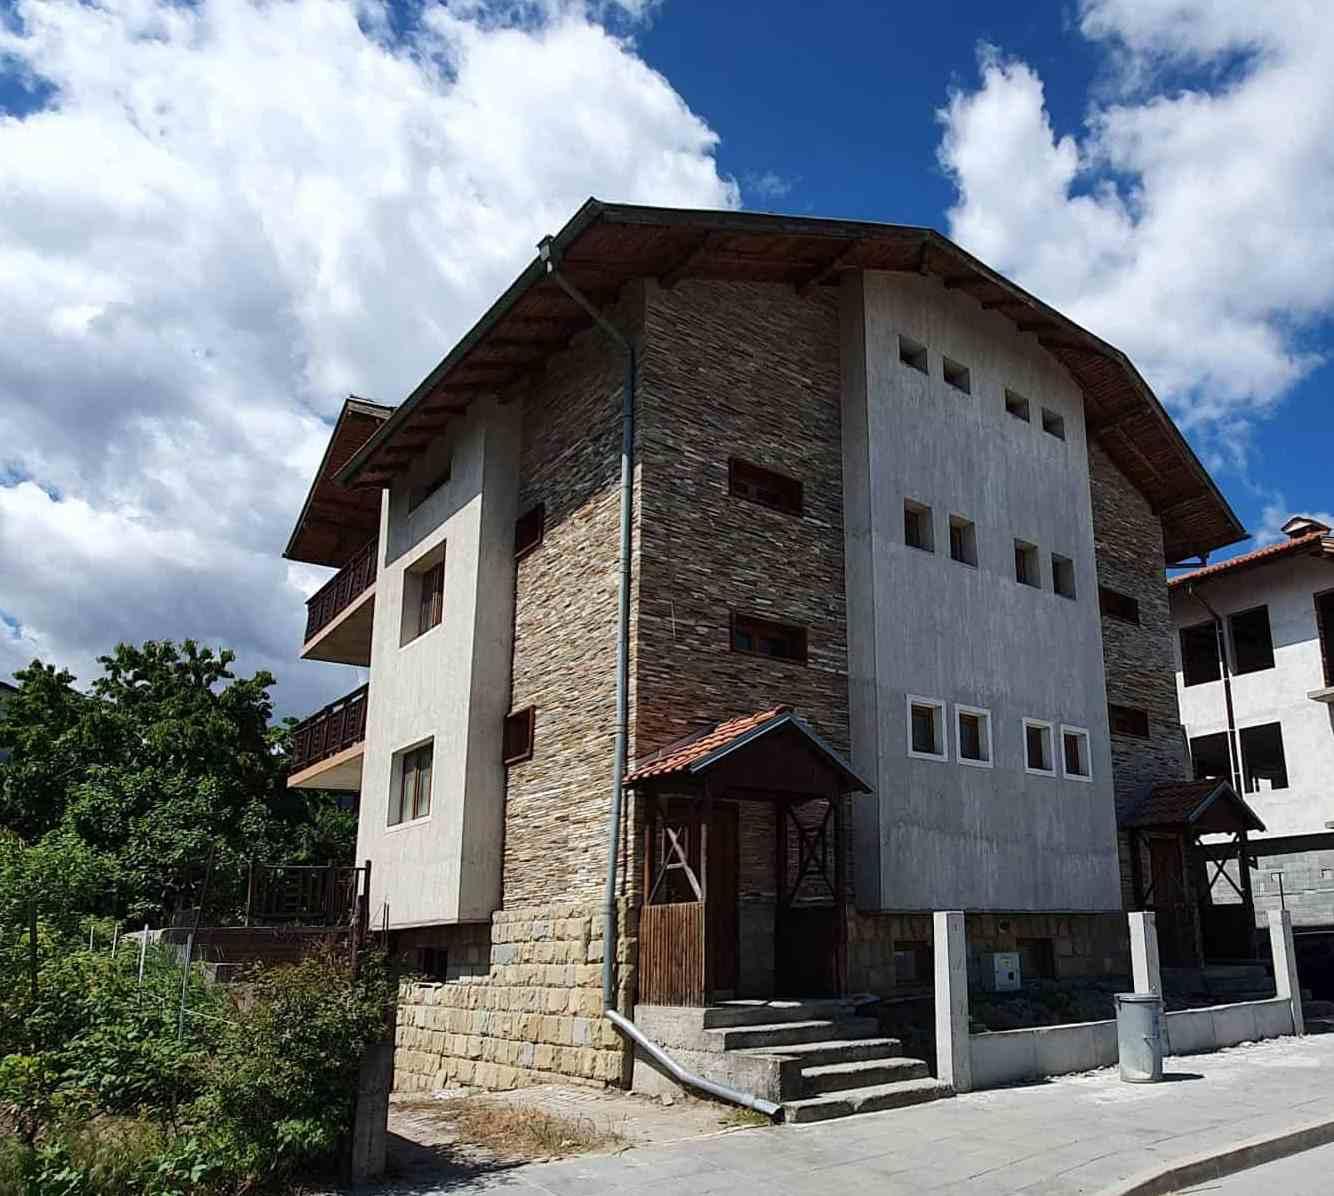 Ski Chalet or Guesthouse for sale in Bansko